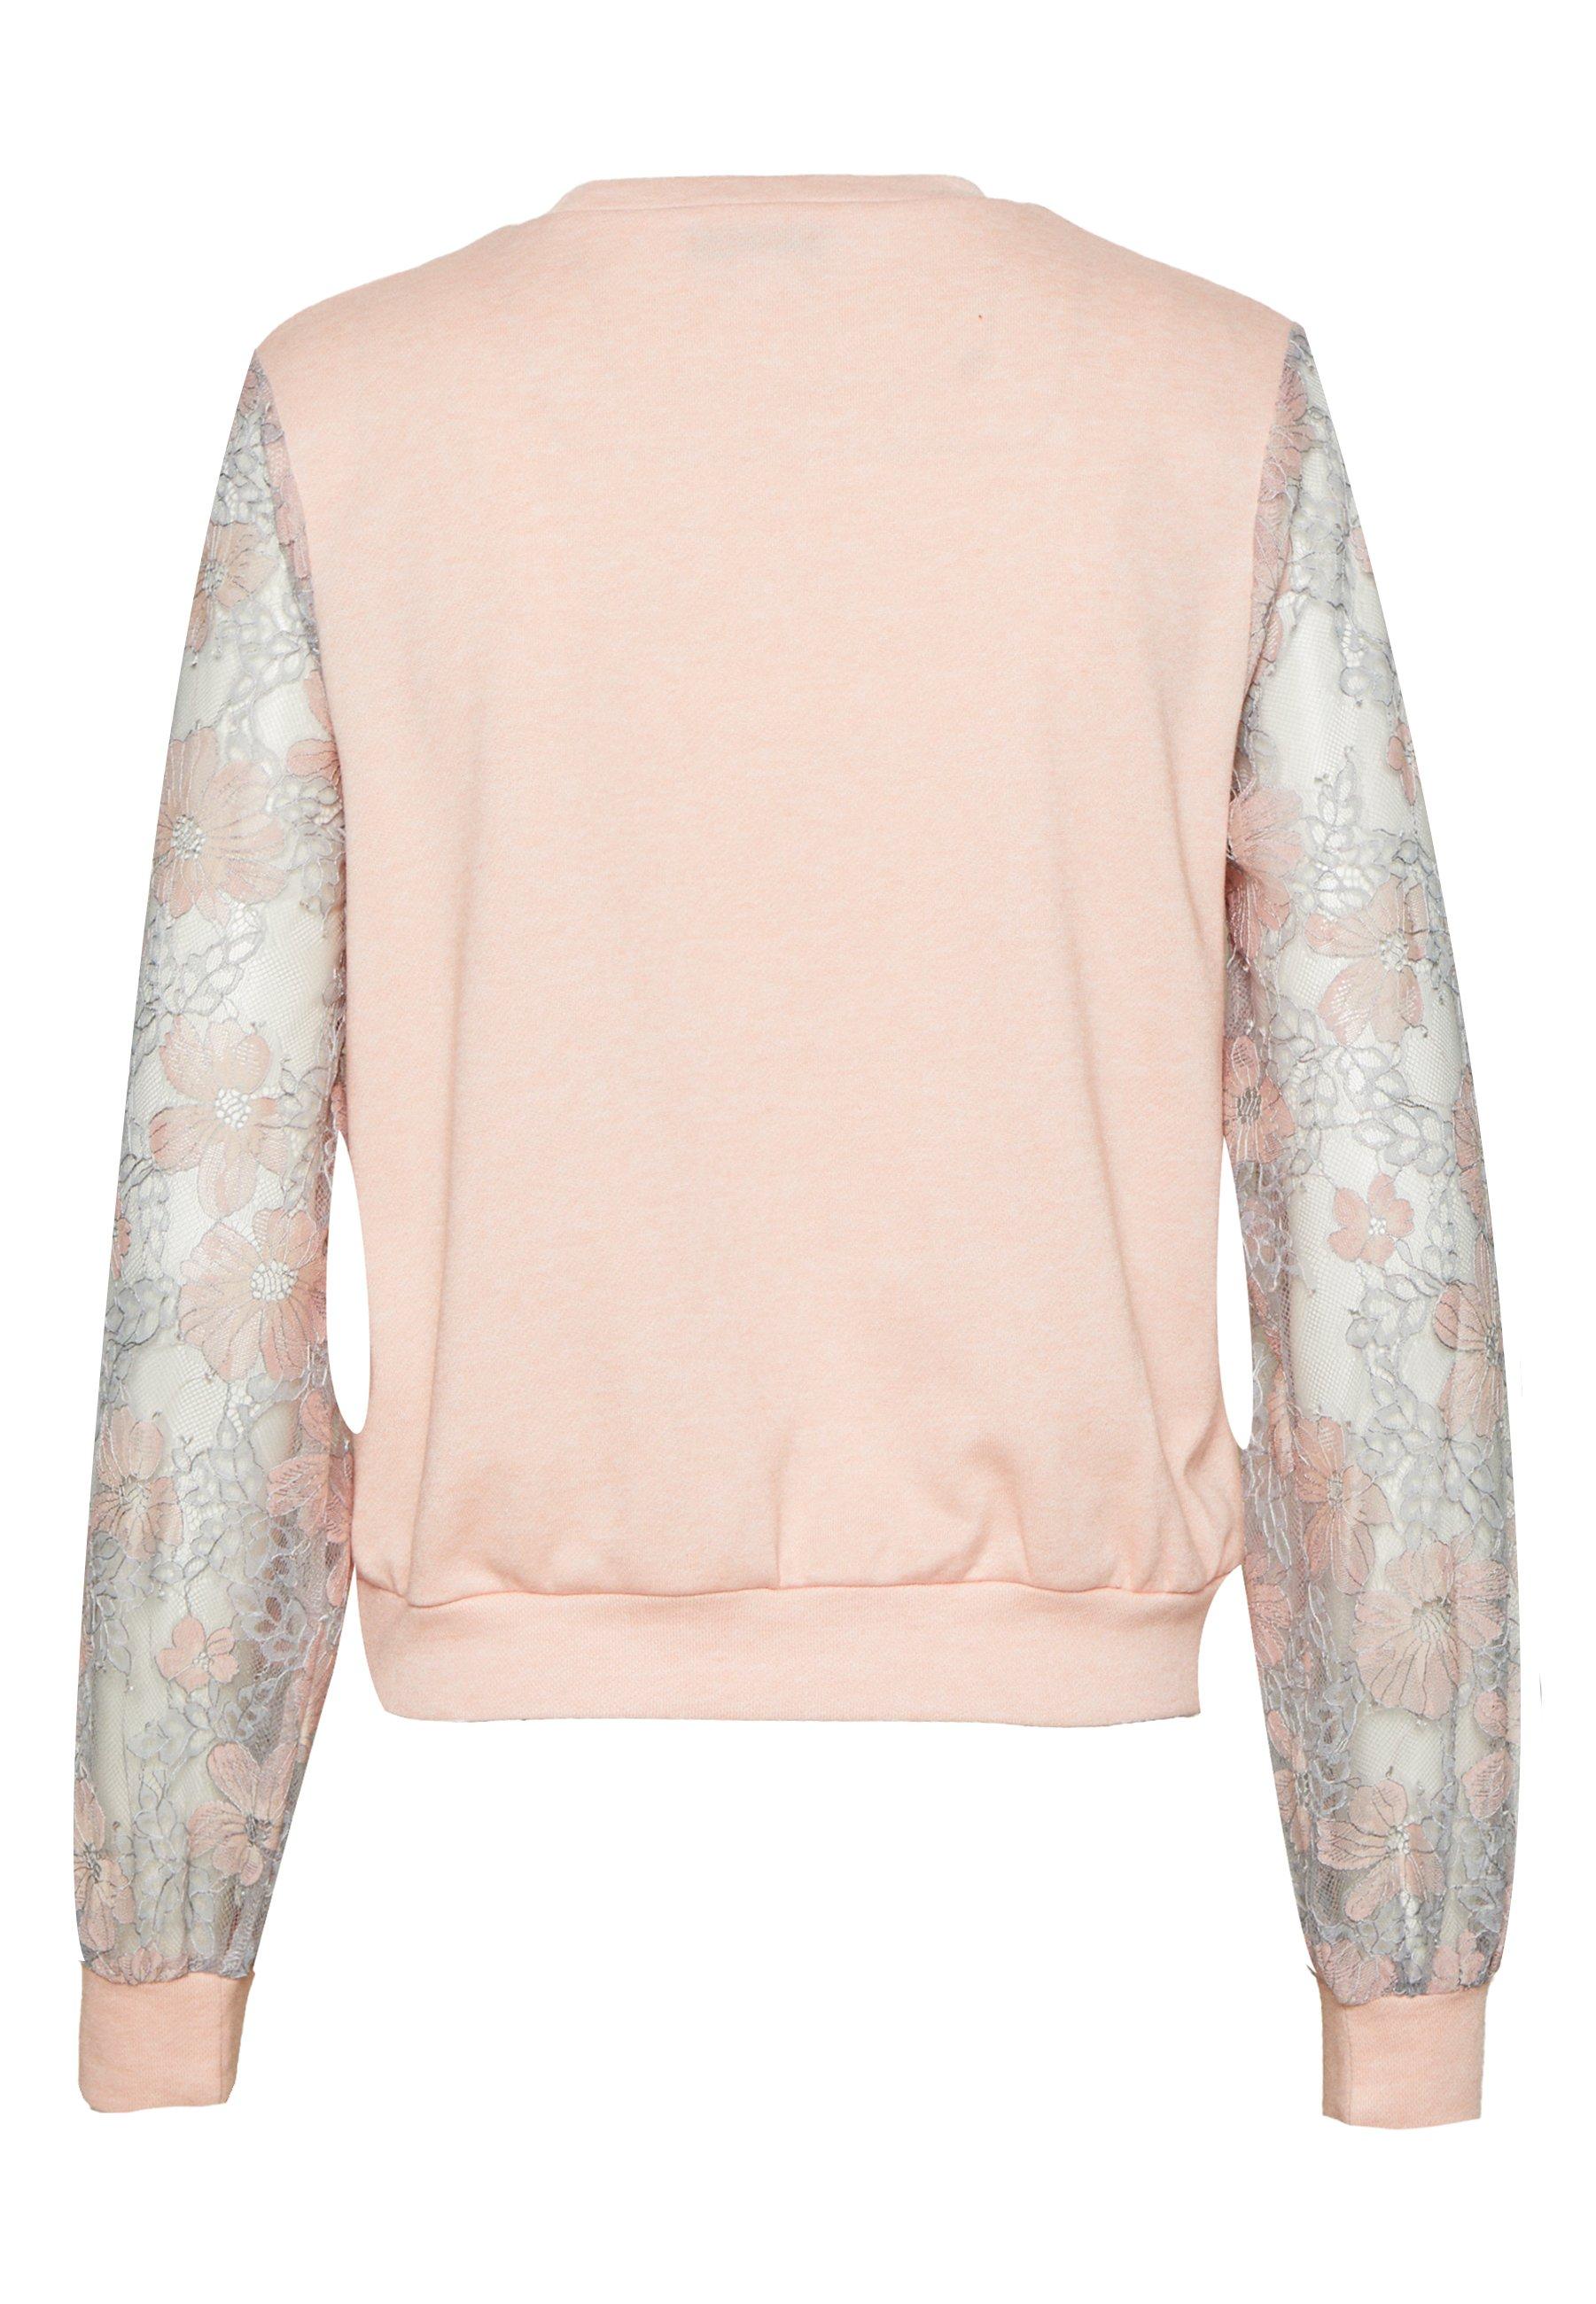 Lost Ink Sweatshirt - Apricot Melange